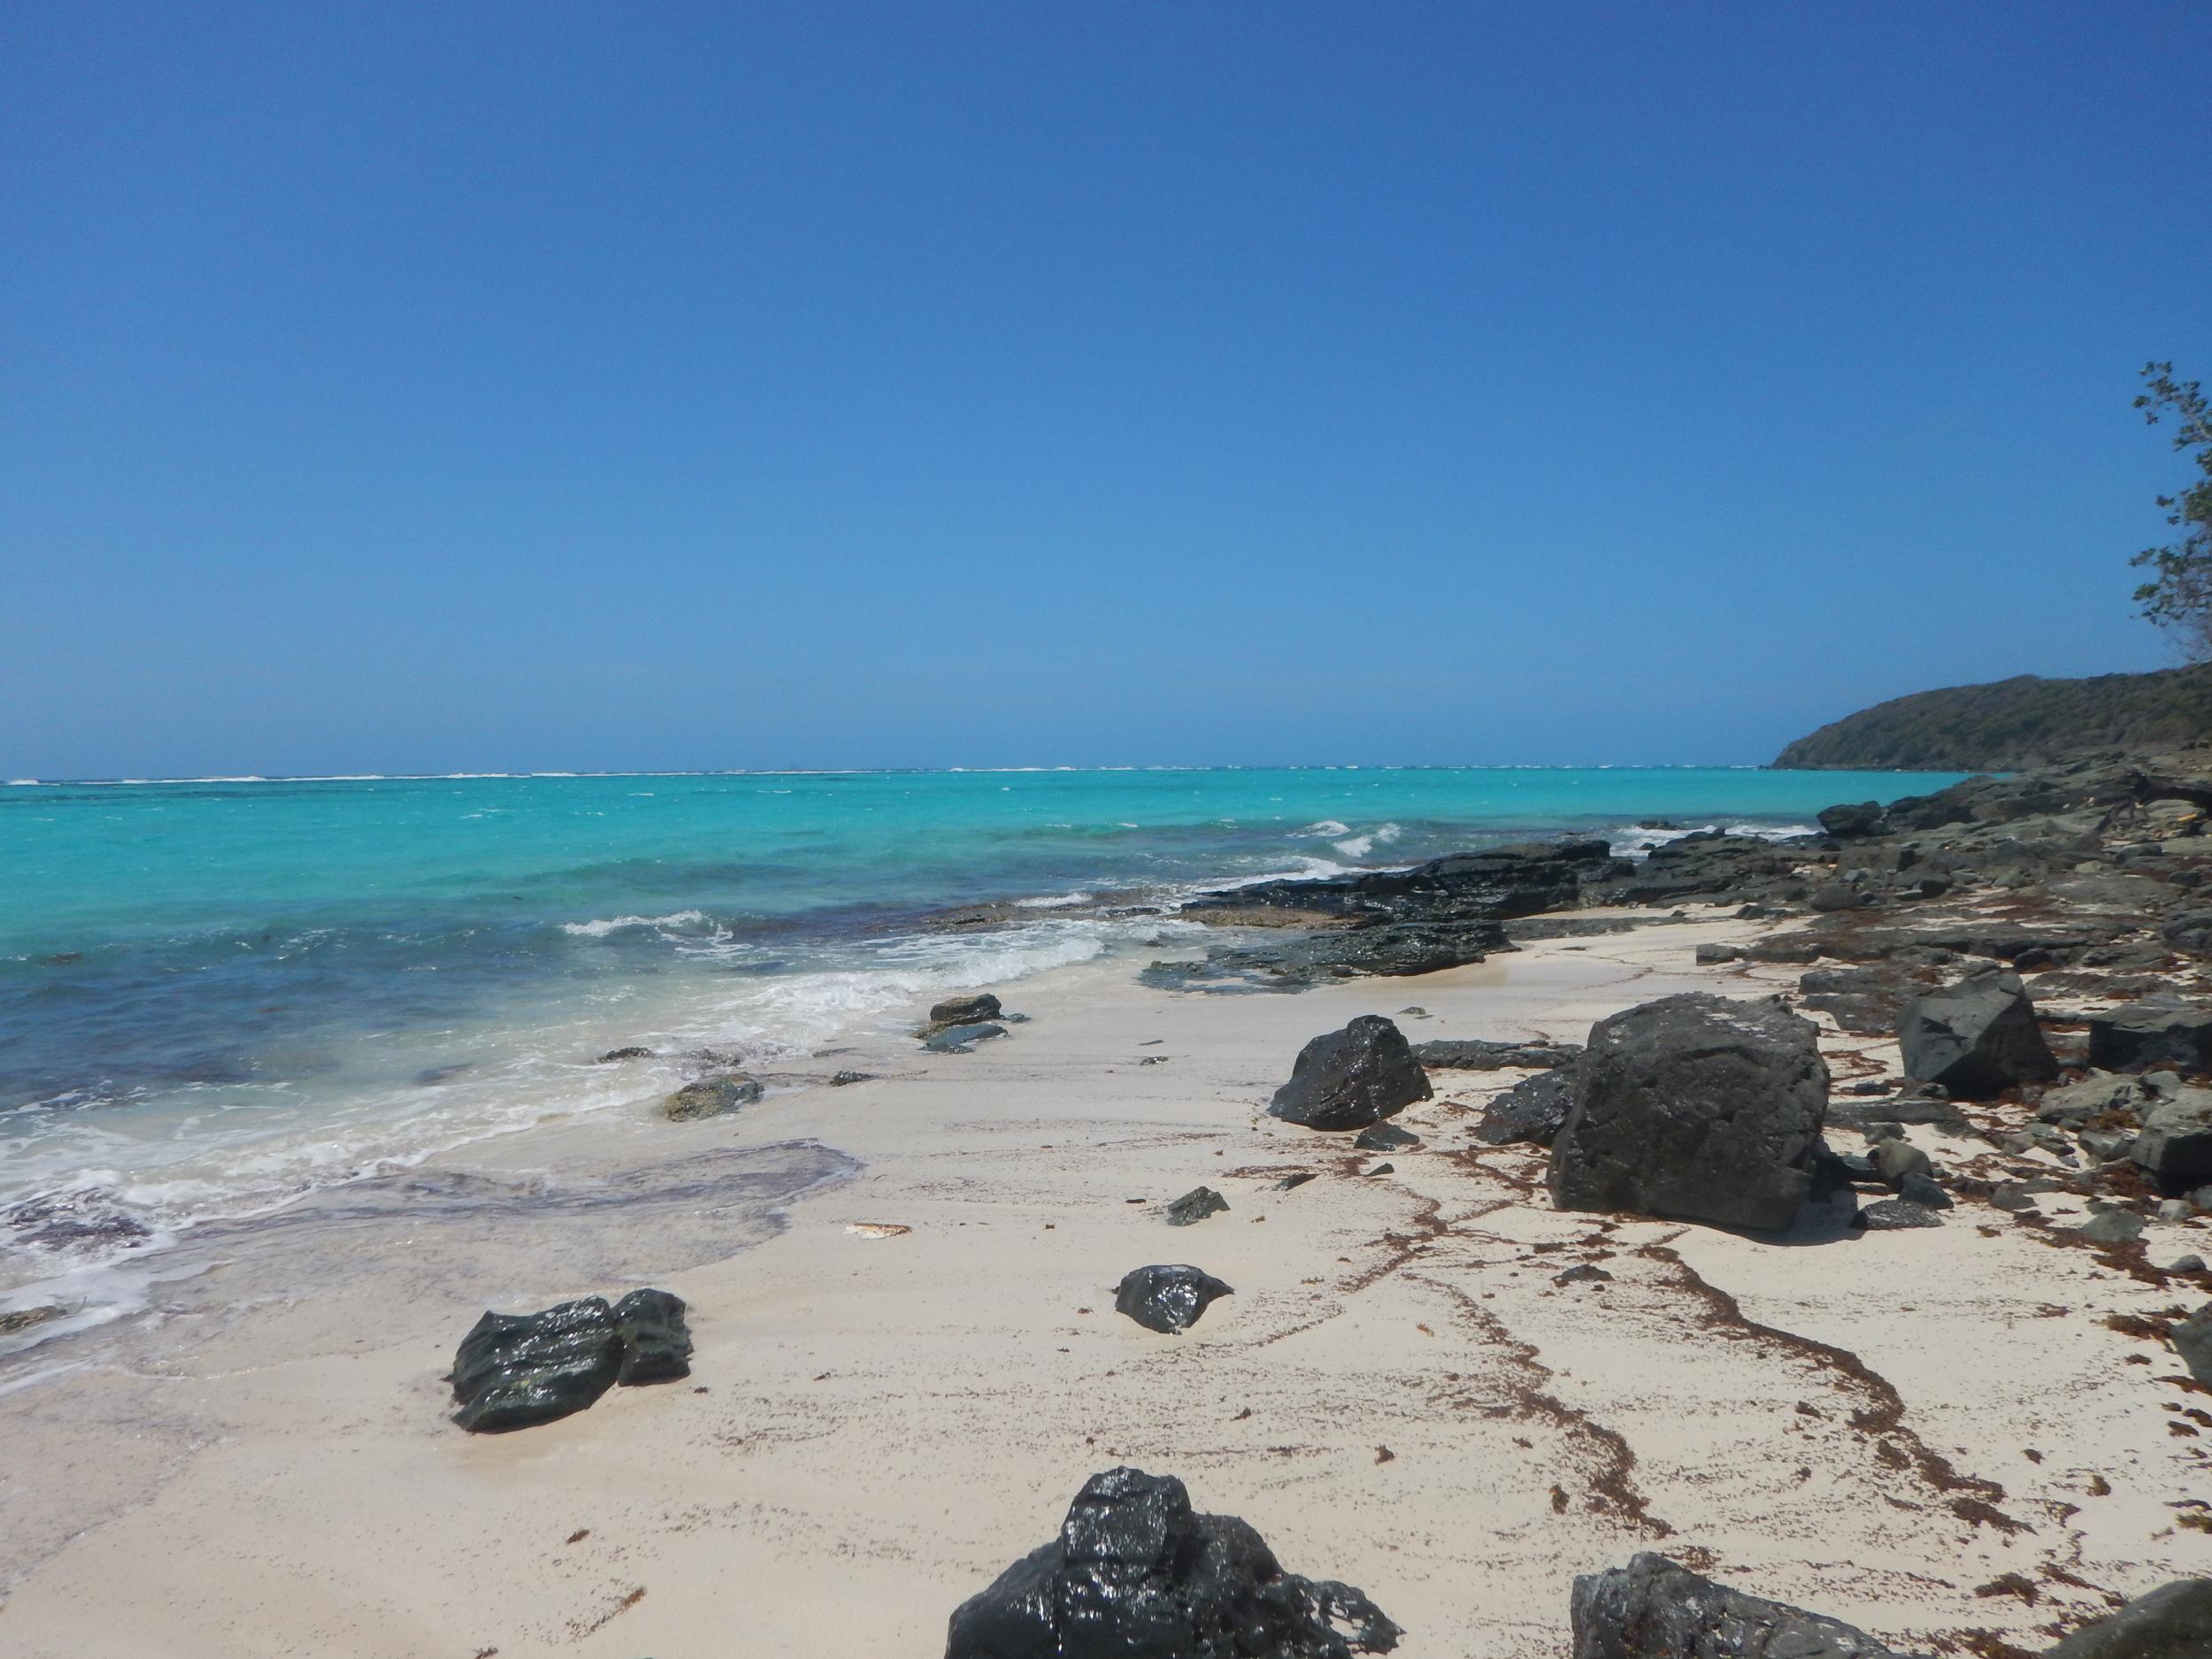 12. Beautiful beach on Canouan